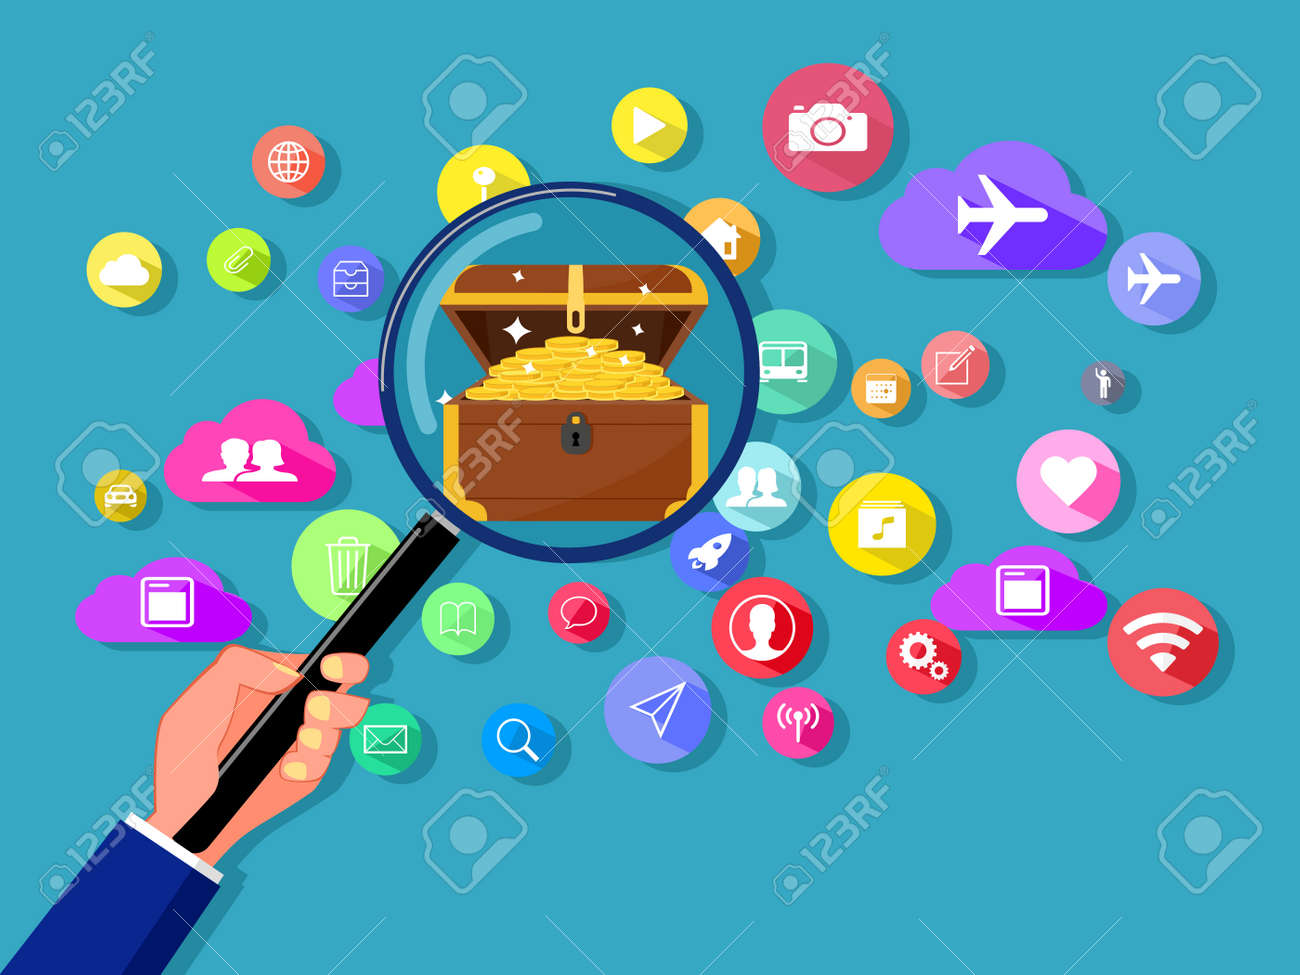 Finding treasures on online communication networks. Vector illustration - 168017224